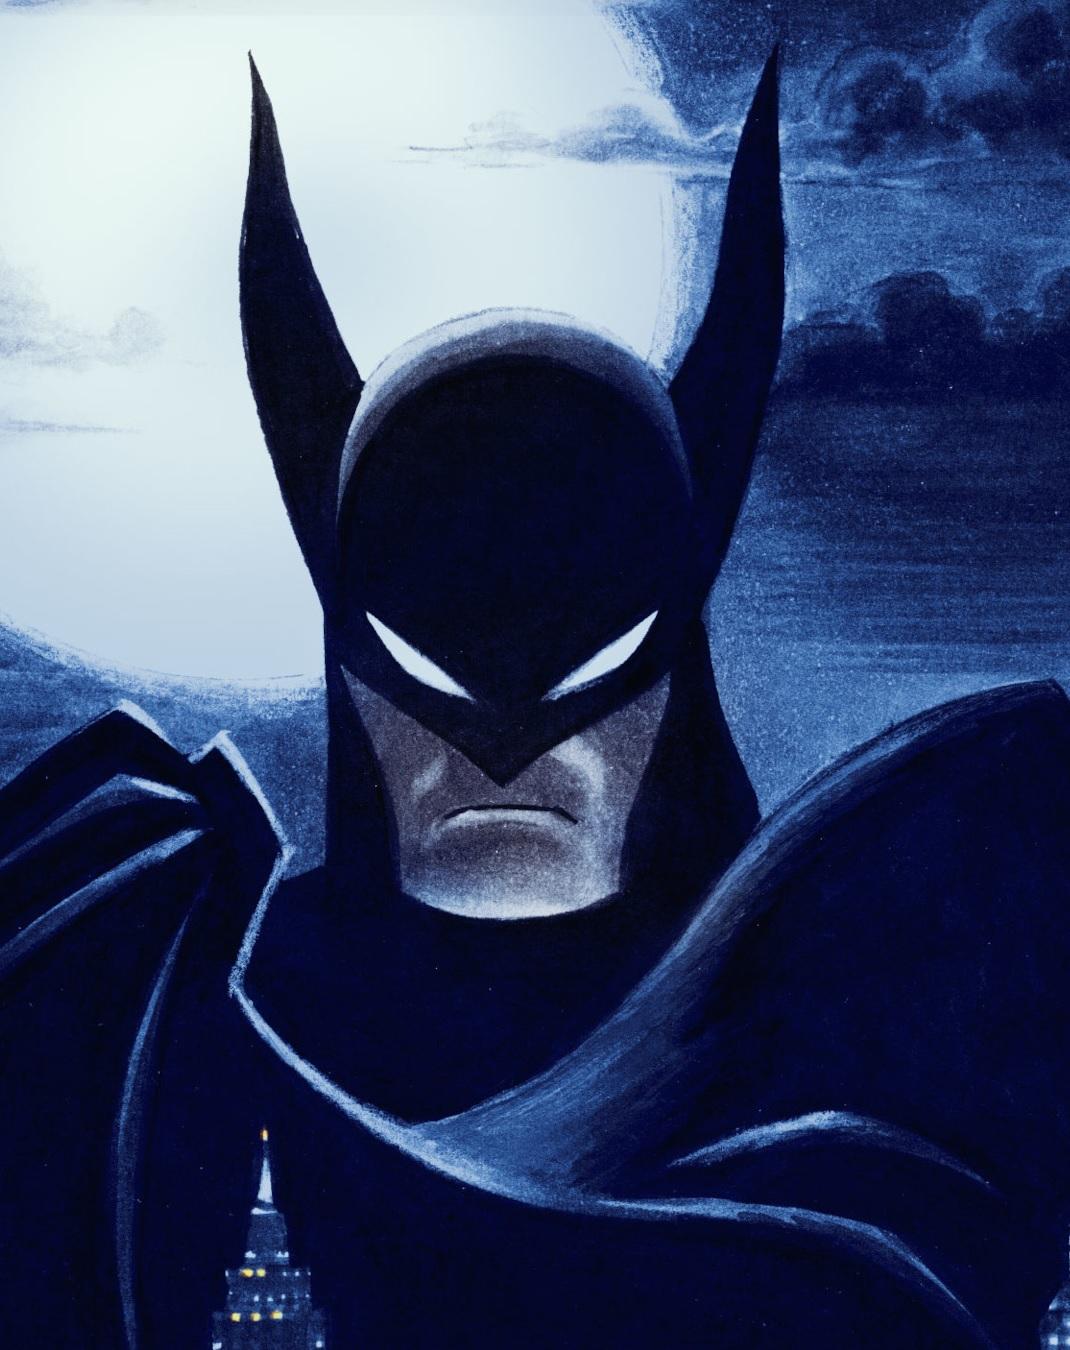 Soubor:Batman Caped Crusader.jpg